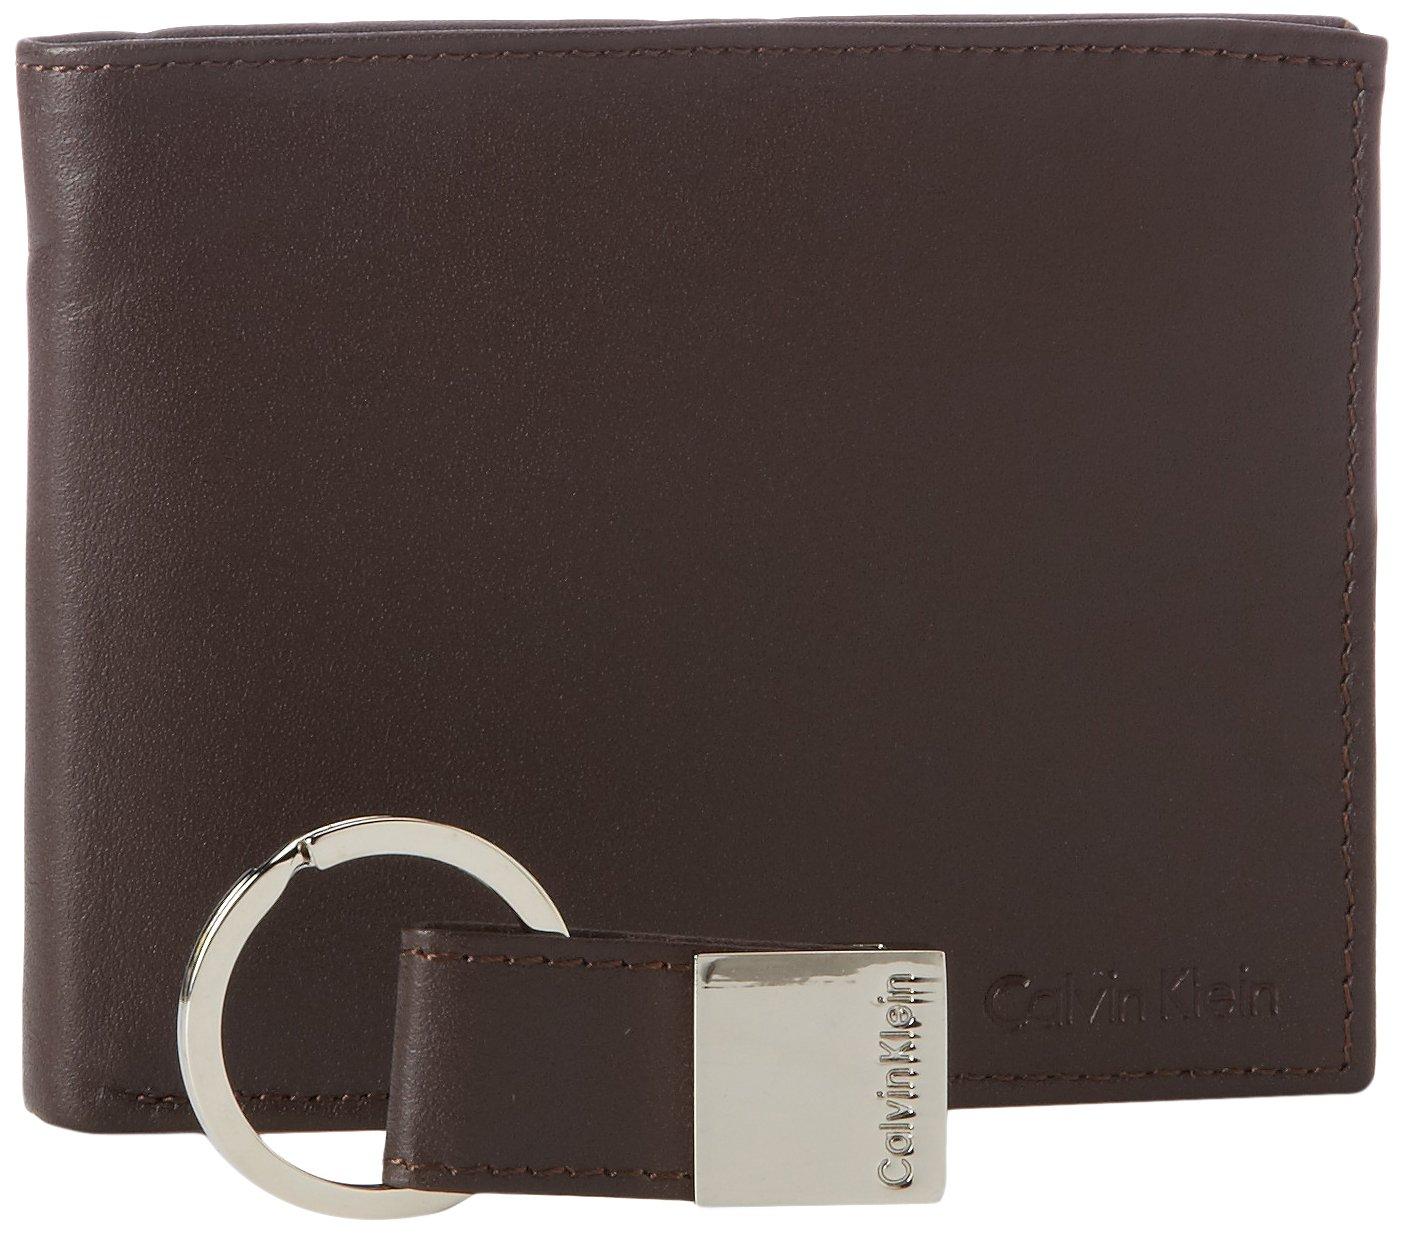 Calvin Klein Men's Leather Bookfold,Brown,One Size